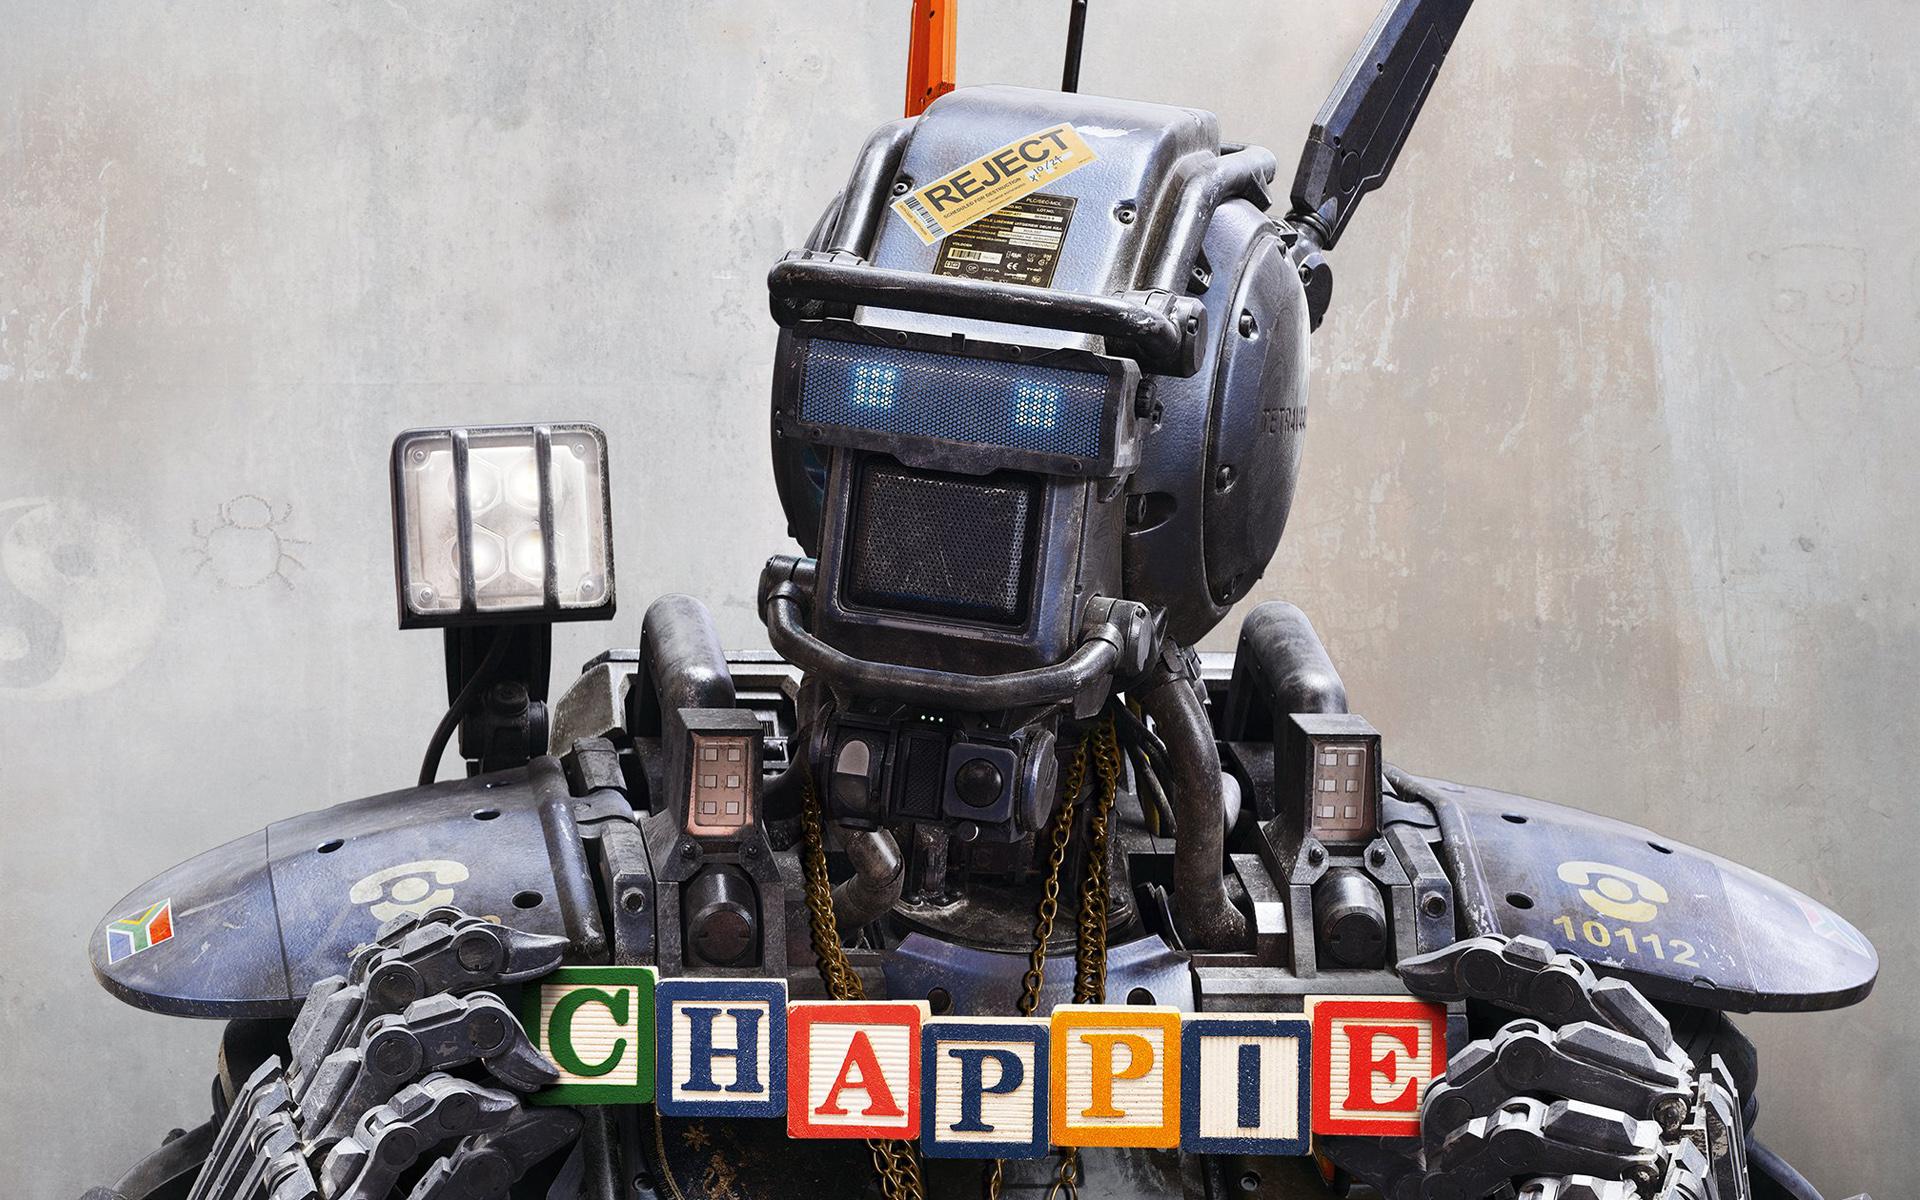 Chappie.jpg